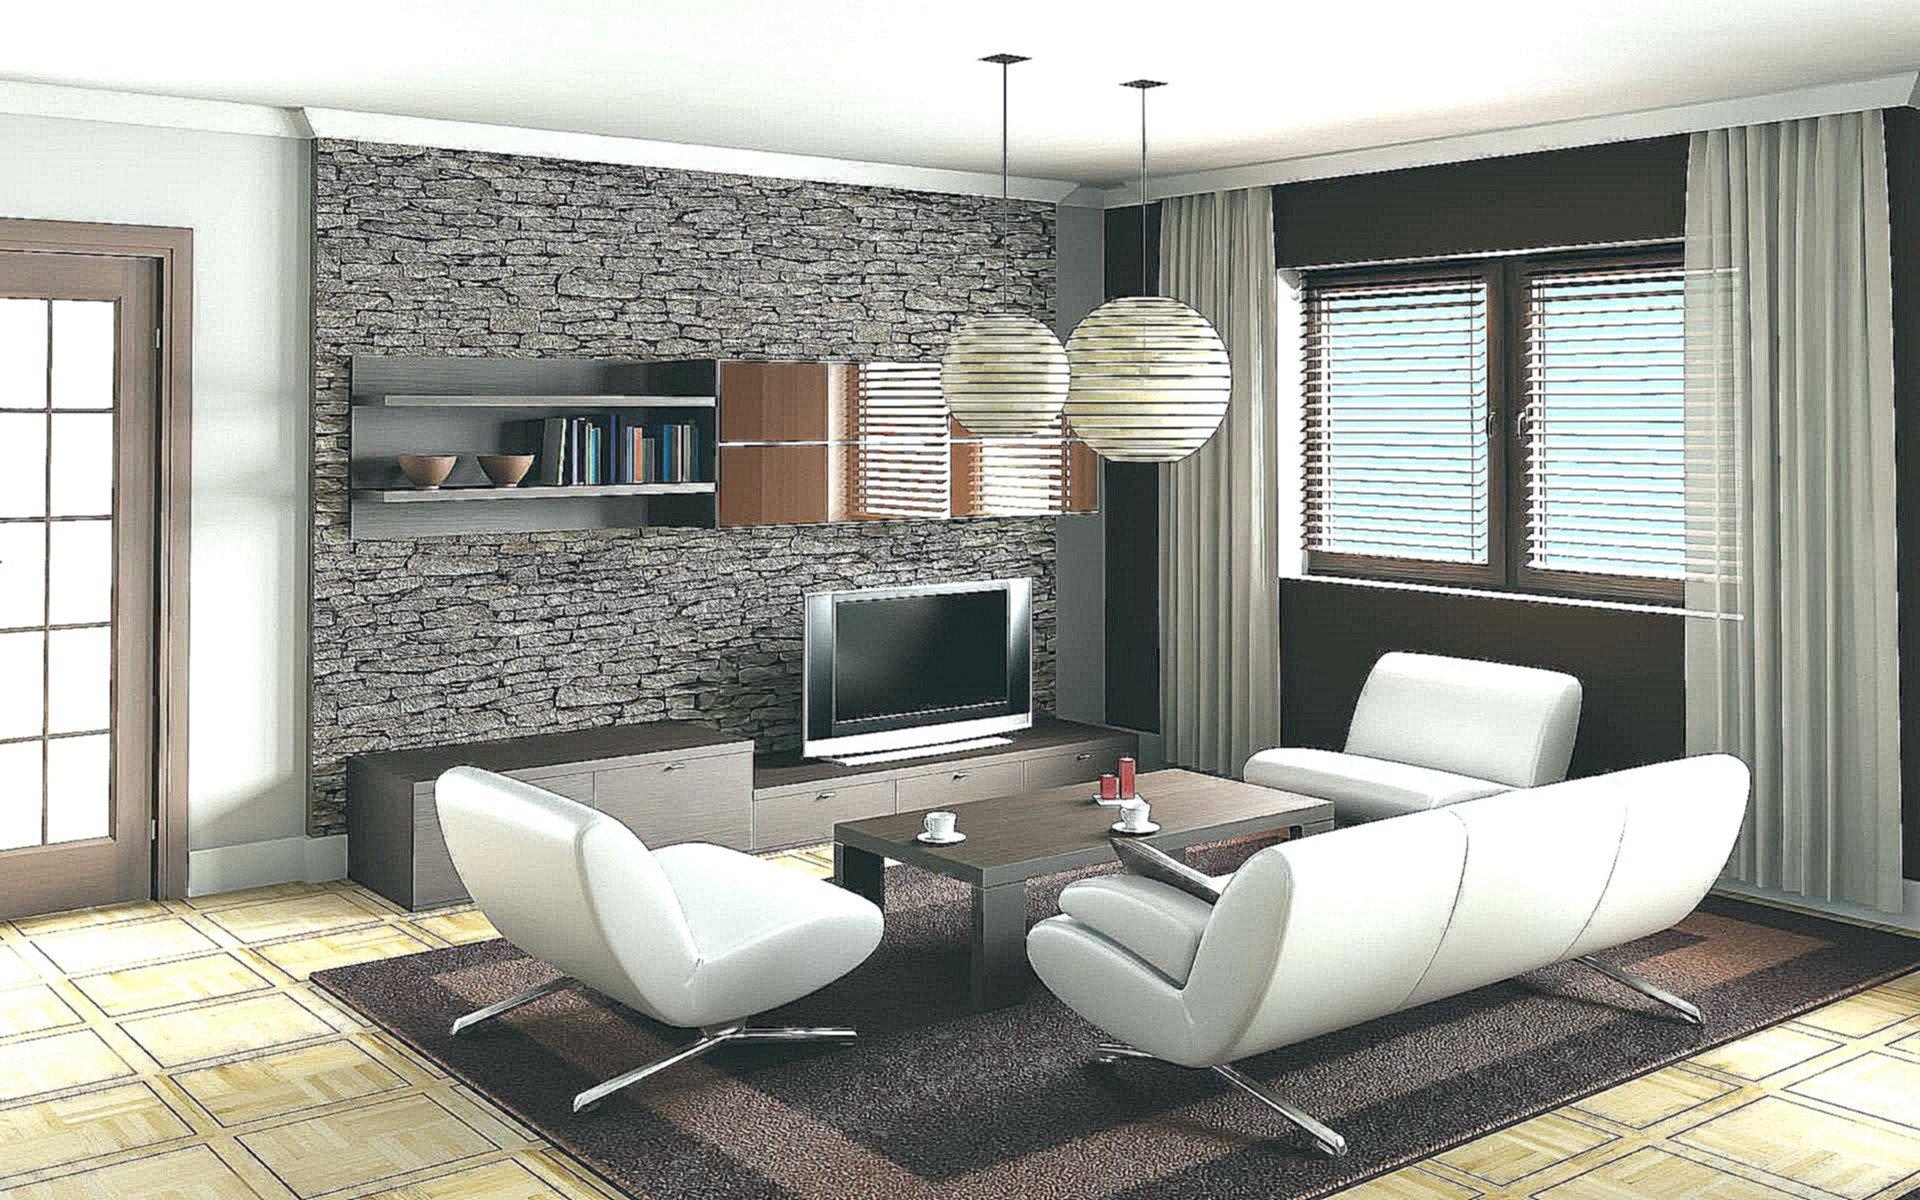 Contemporary Living Room Wallpaper Luxury 39 Wallpaper Design for Living Room Contemporary Wallpaper Living Room Room Design Ideas